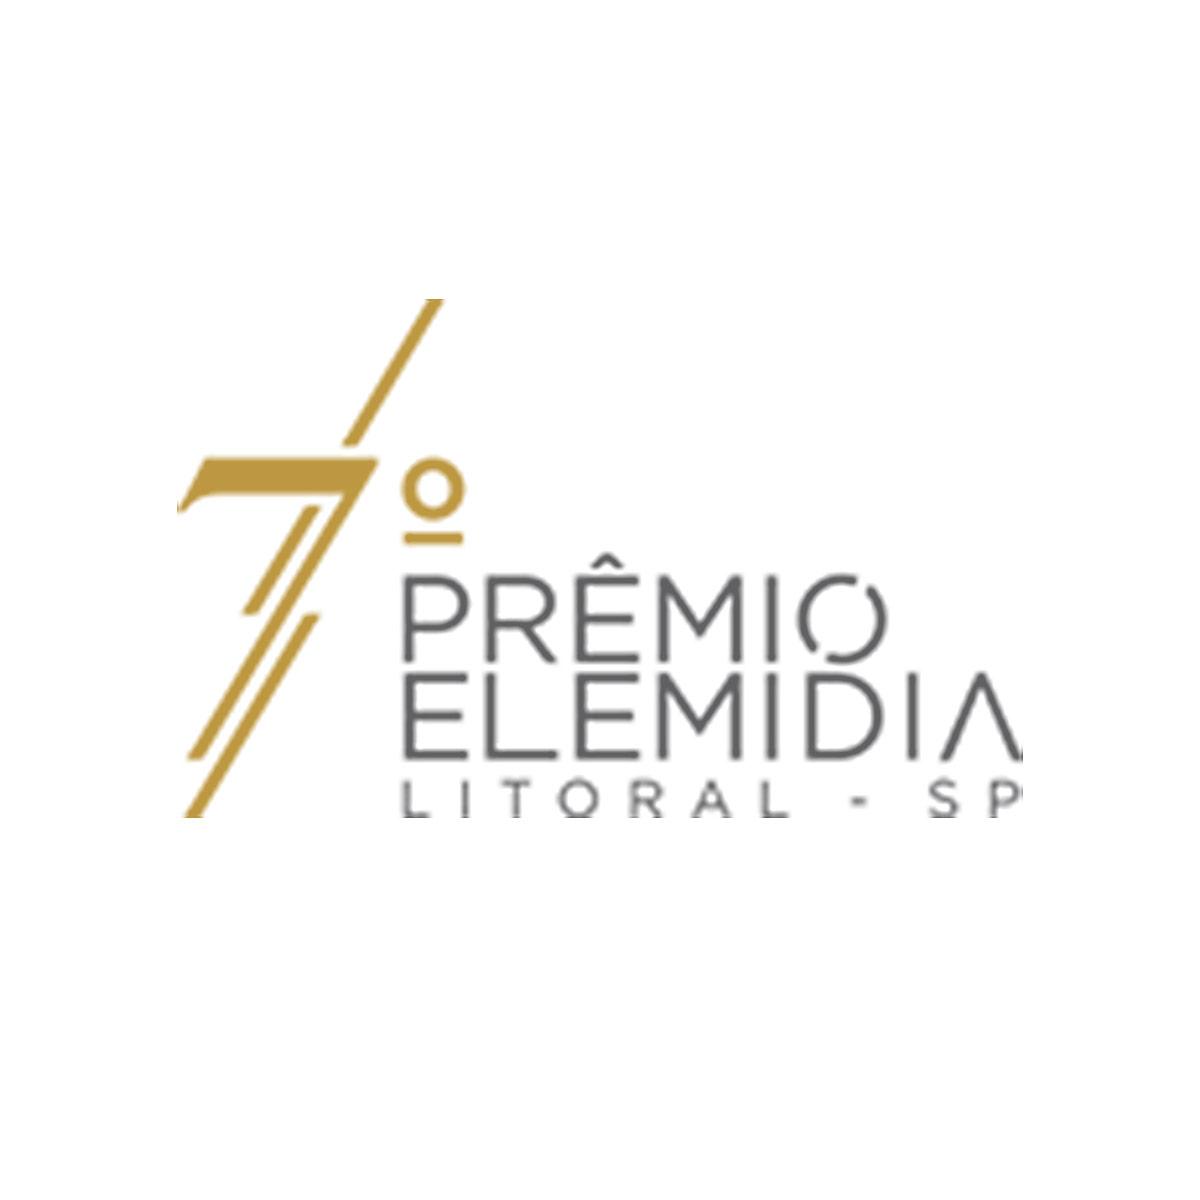 Prêmio Elemídia 2017